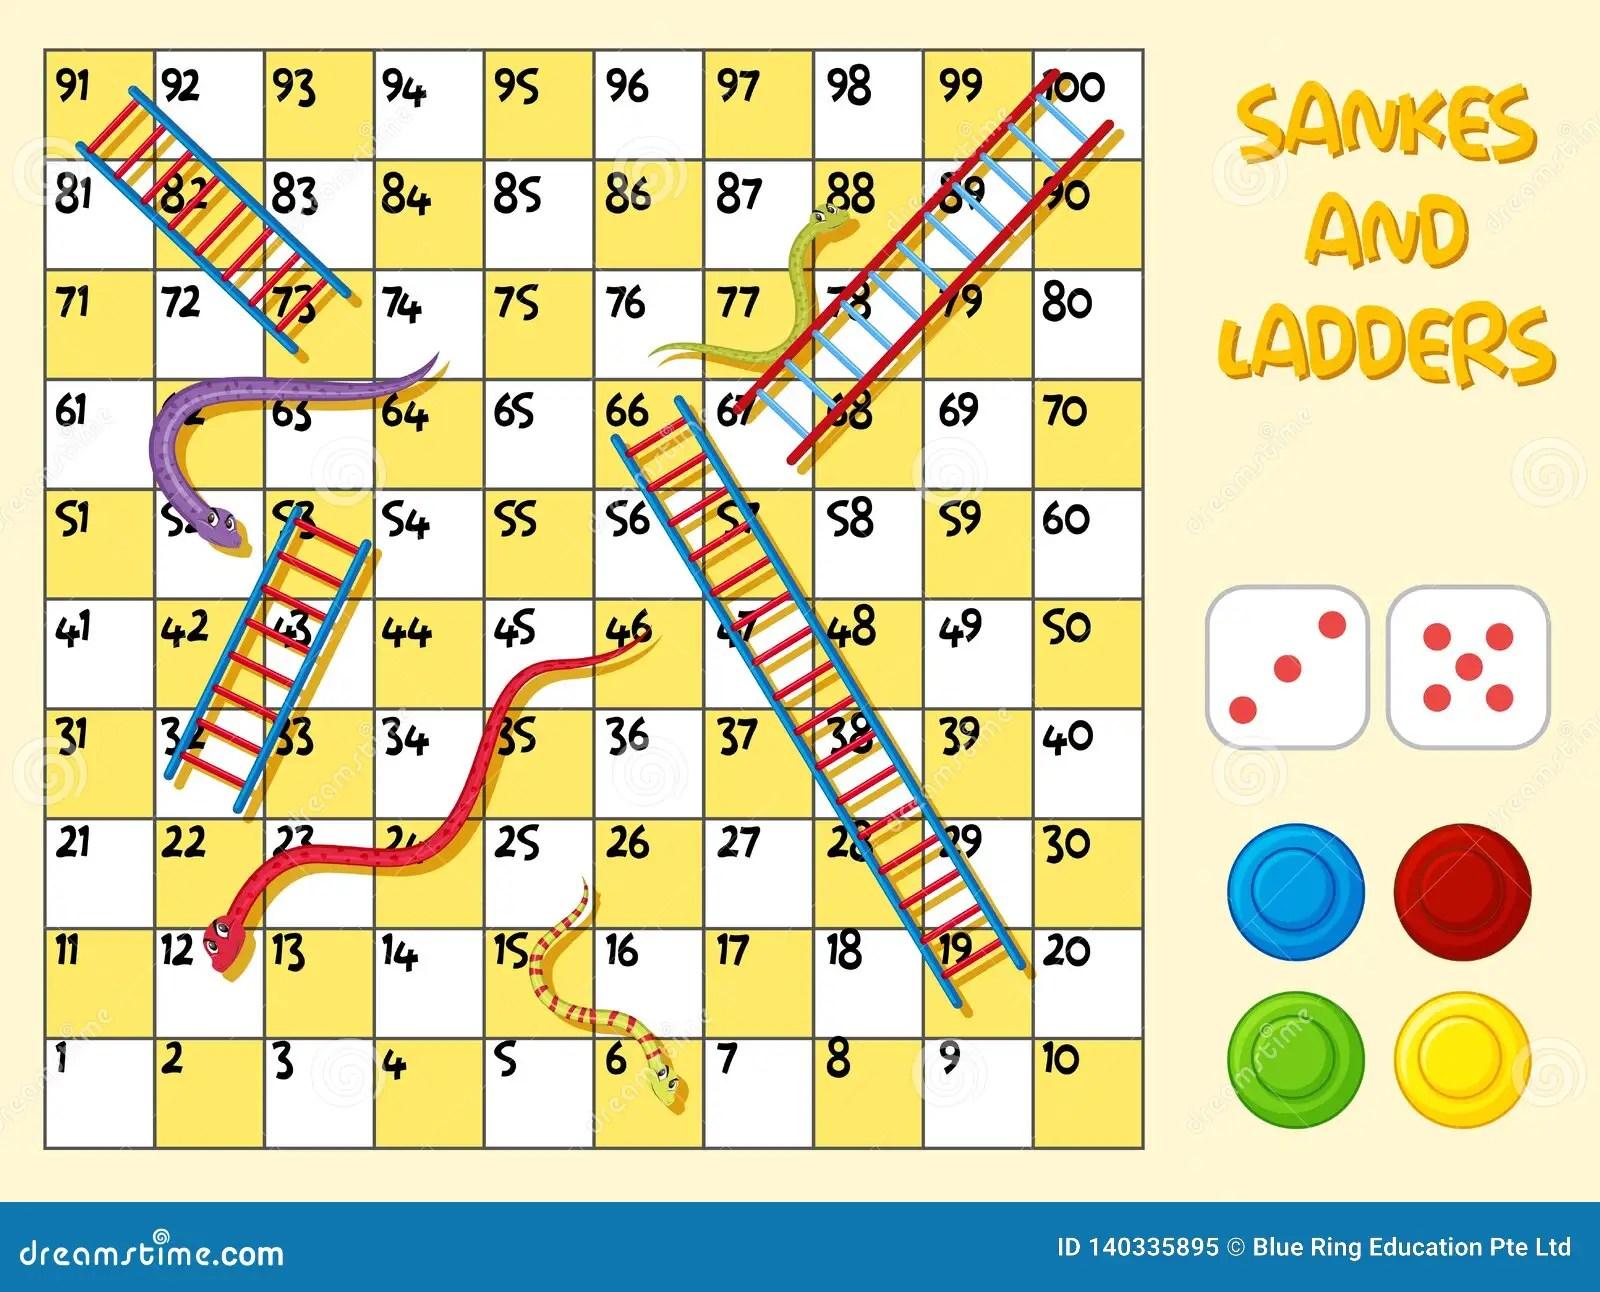 A Snake Ladder Board Game Stock Vector Illustration Of